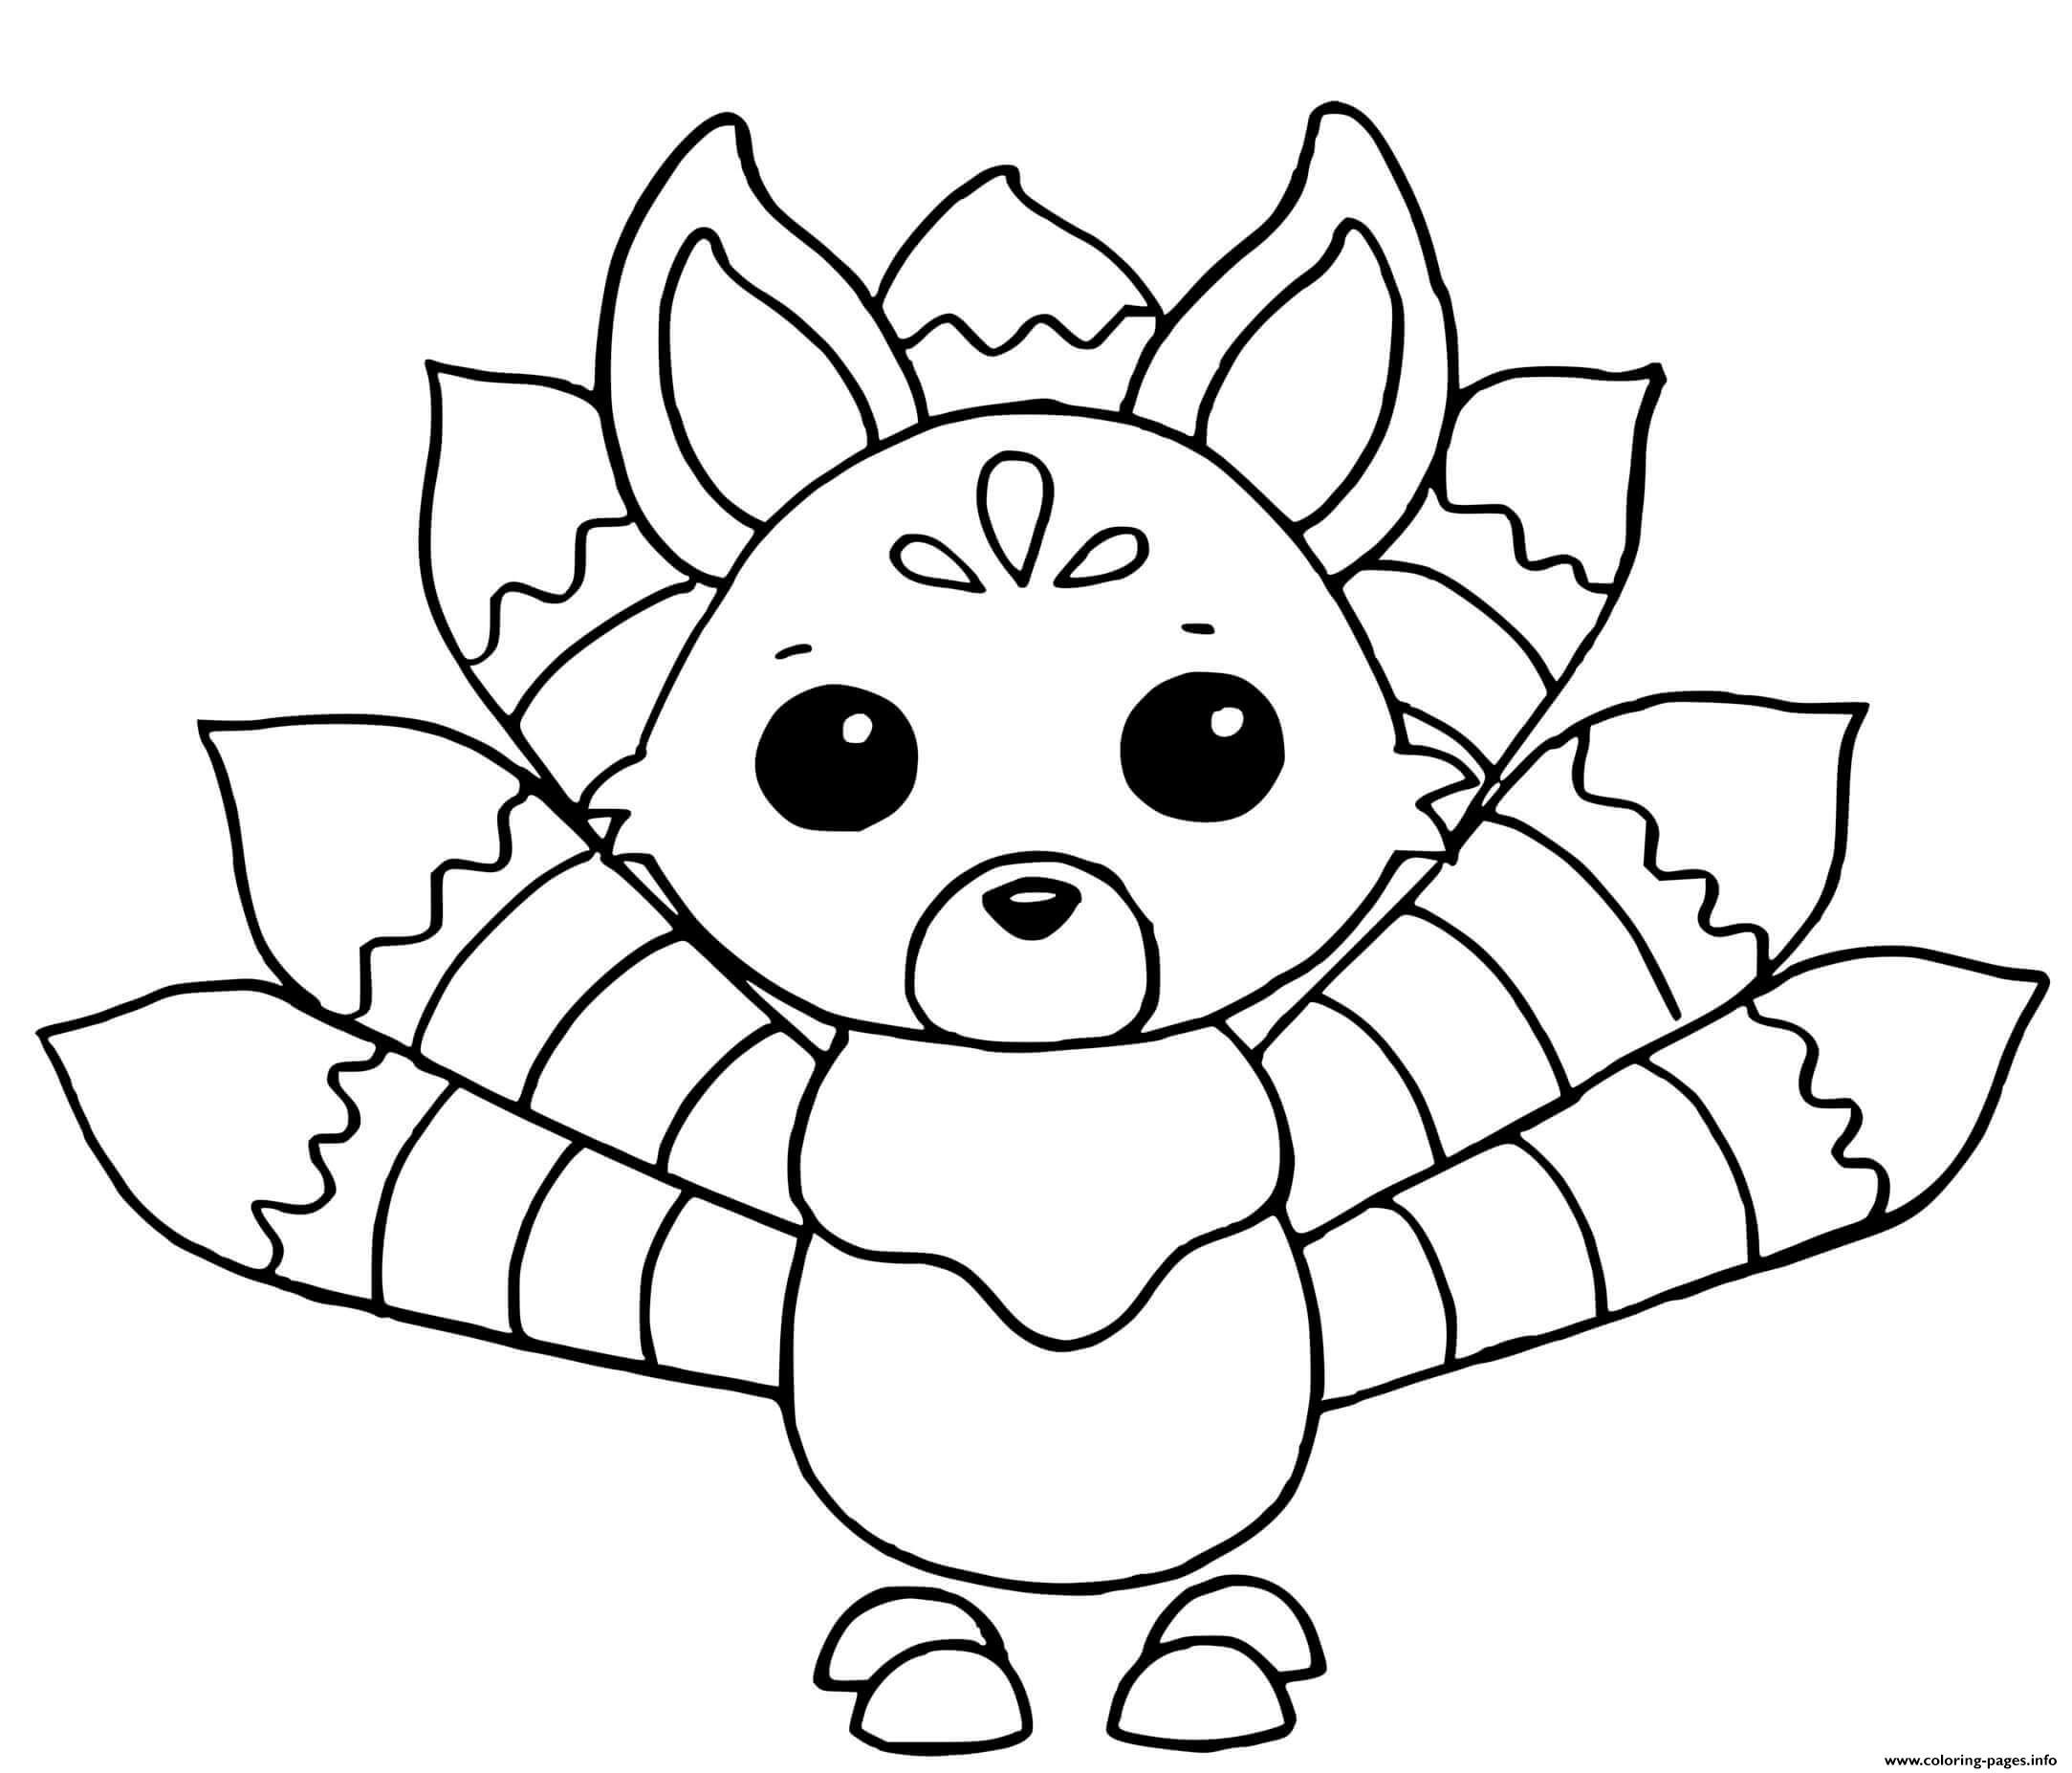 Adopt Me Kitsune Coloring Pages Printable